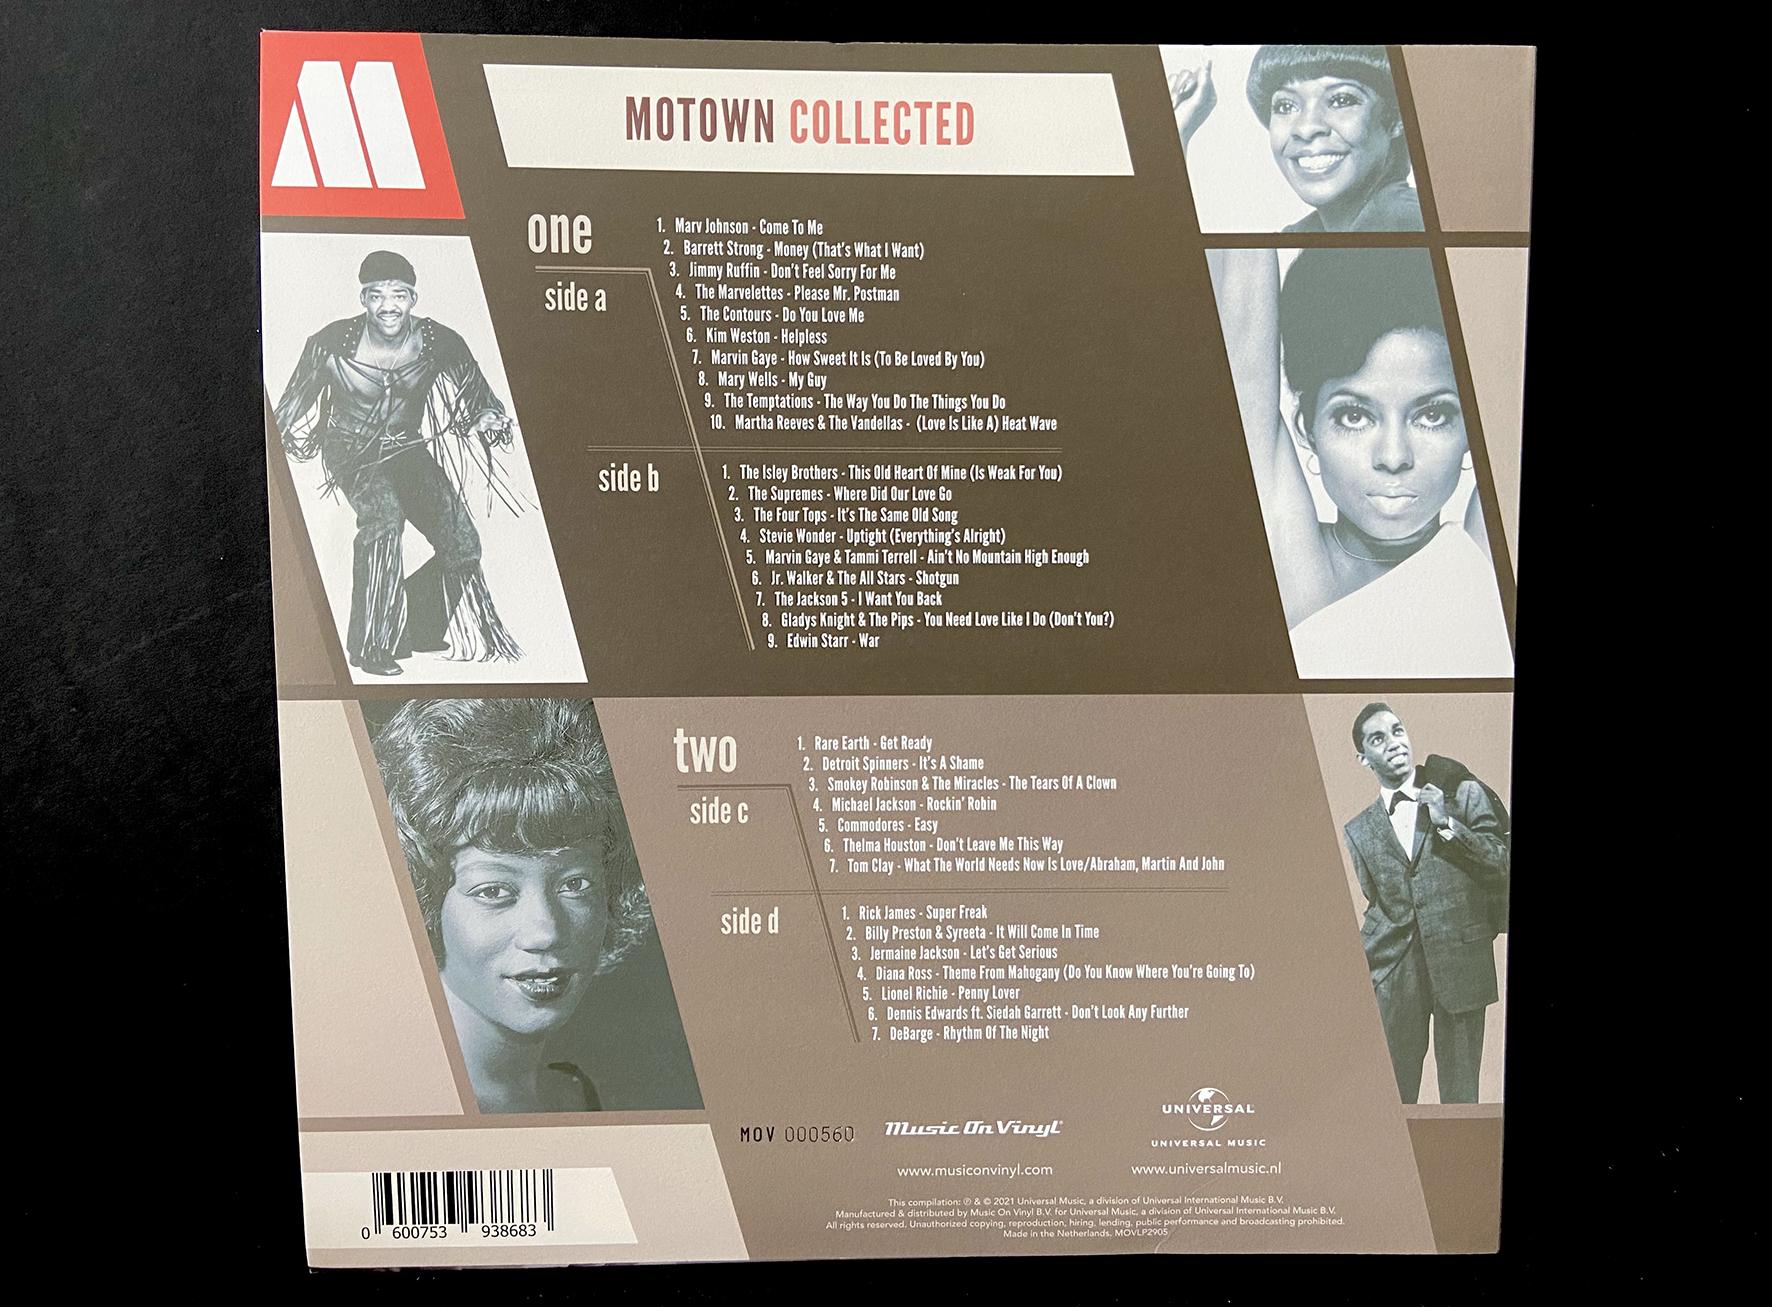 Motown Collected | Sleeve back | Nathan van der Veer